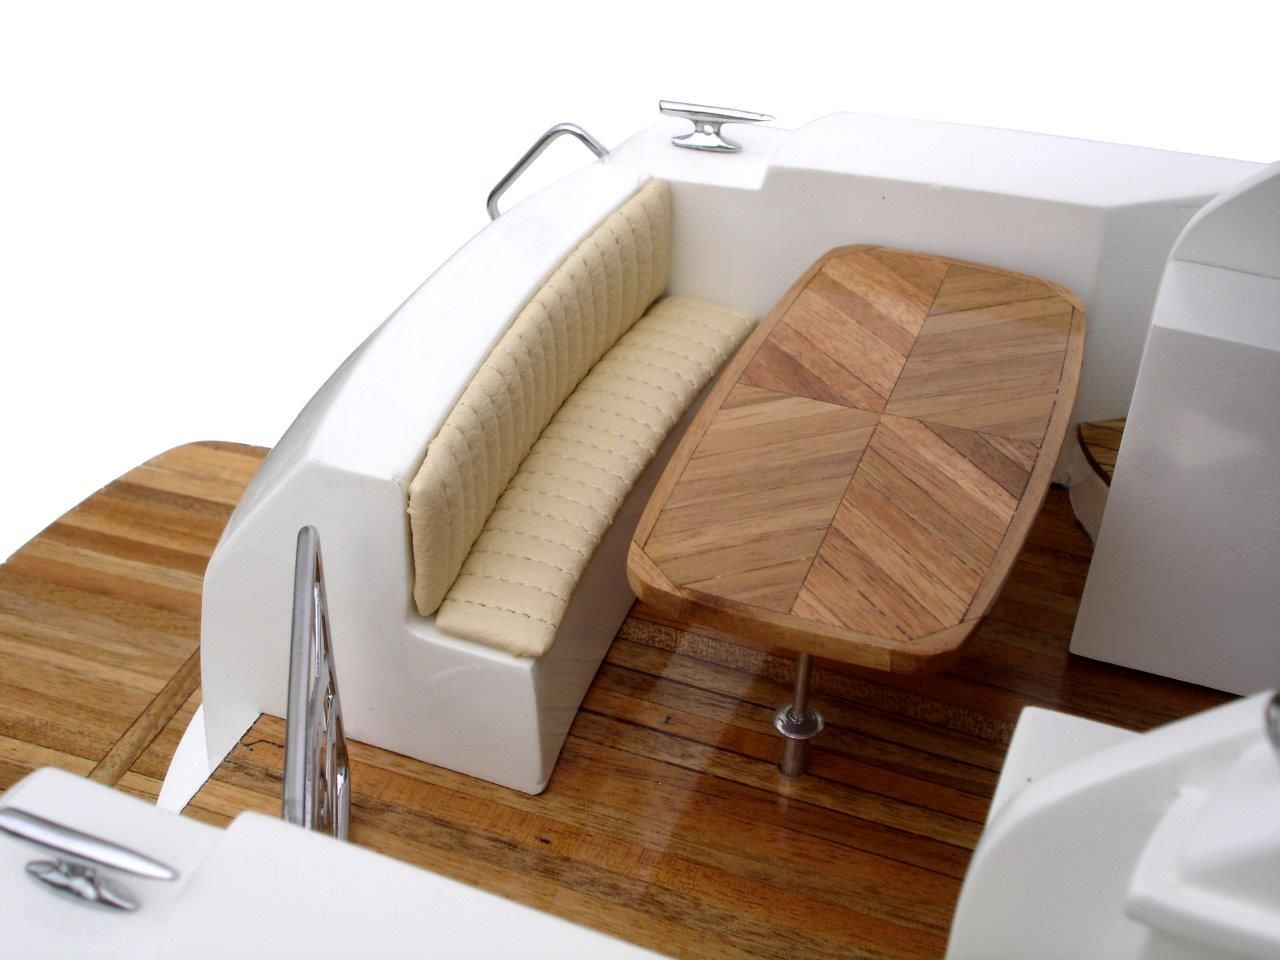 2061-12212-Riviera-4700-model-boat